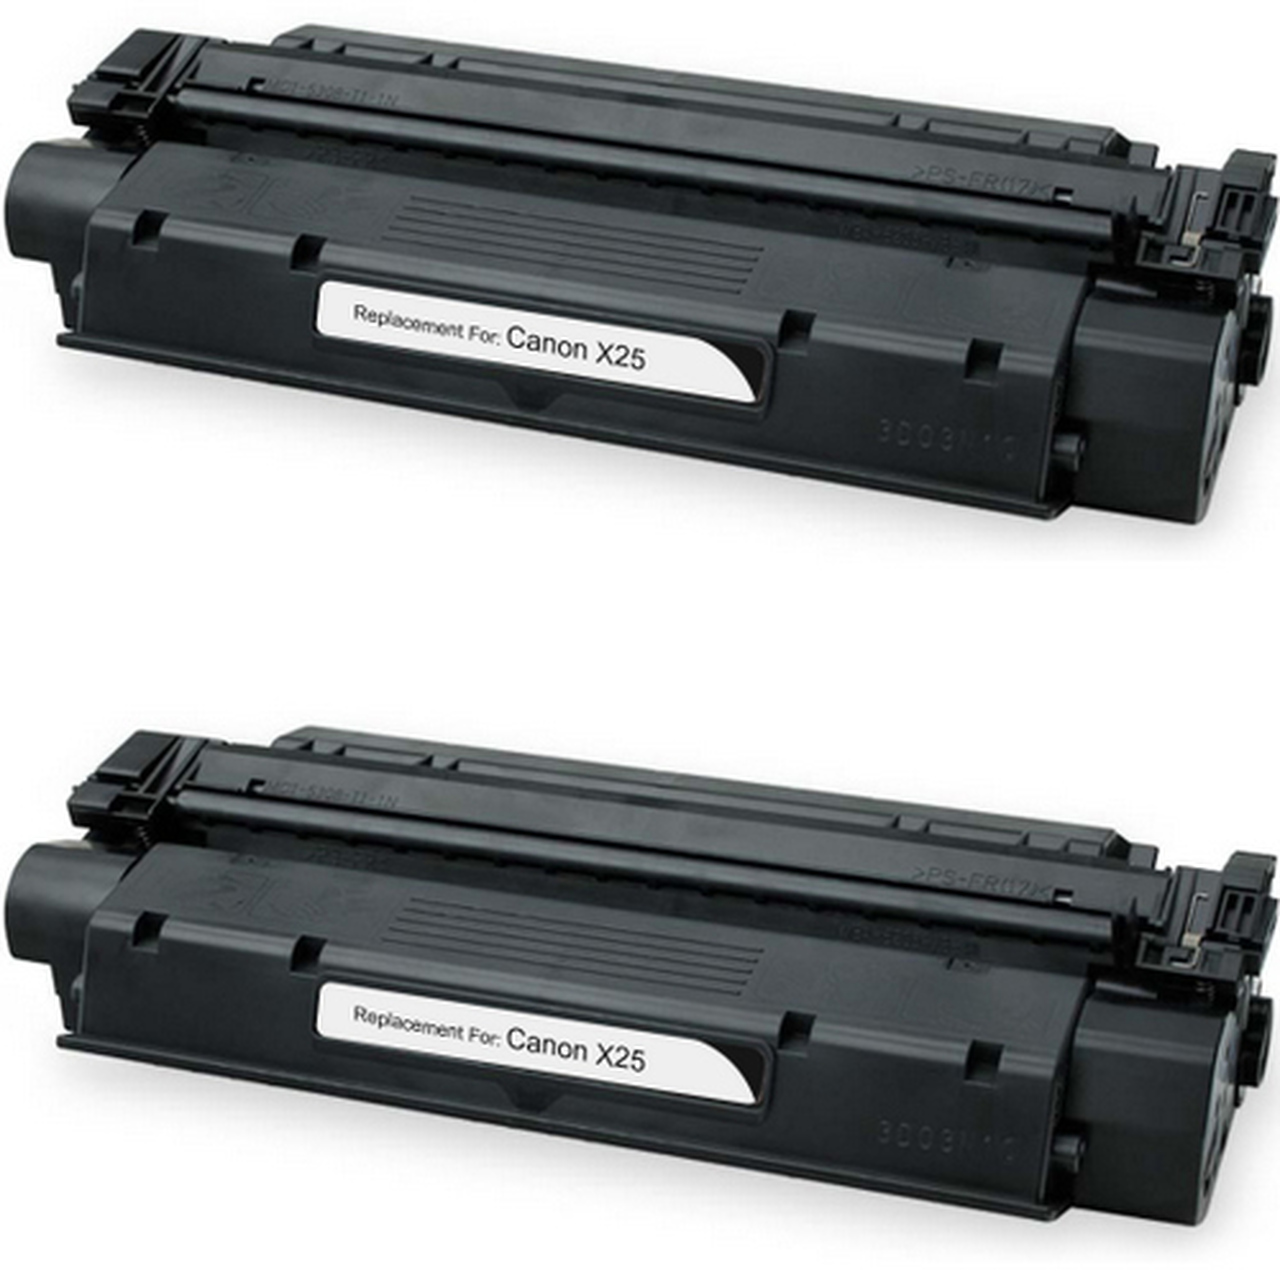 1 Pack 8489A001AA Black Cartridge For Canon X25 Toner ImageClass MF3240 Printer